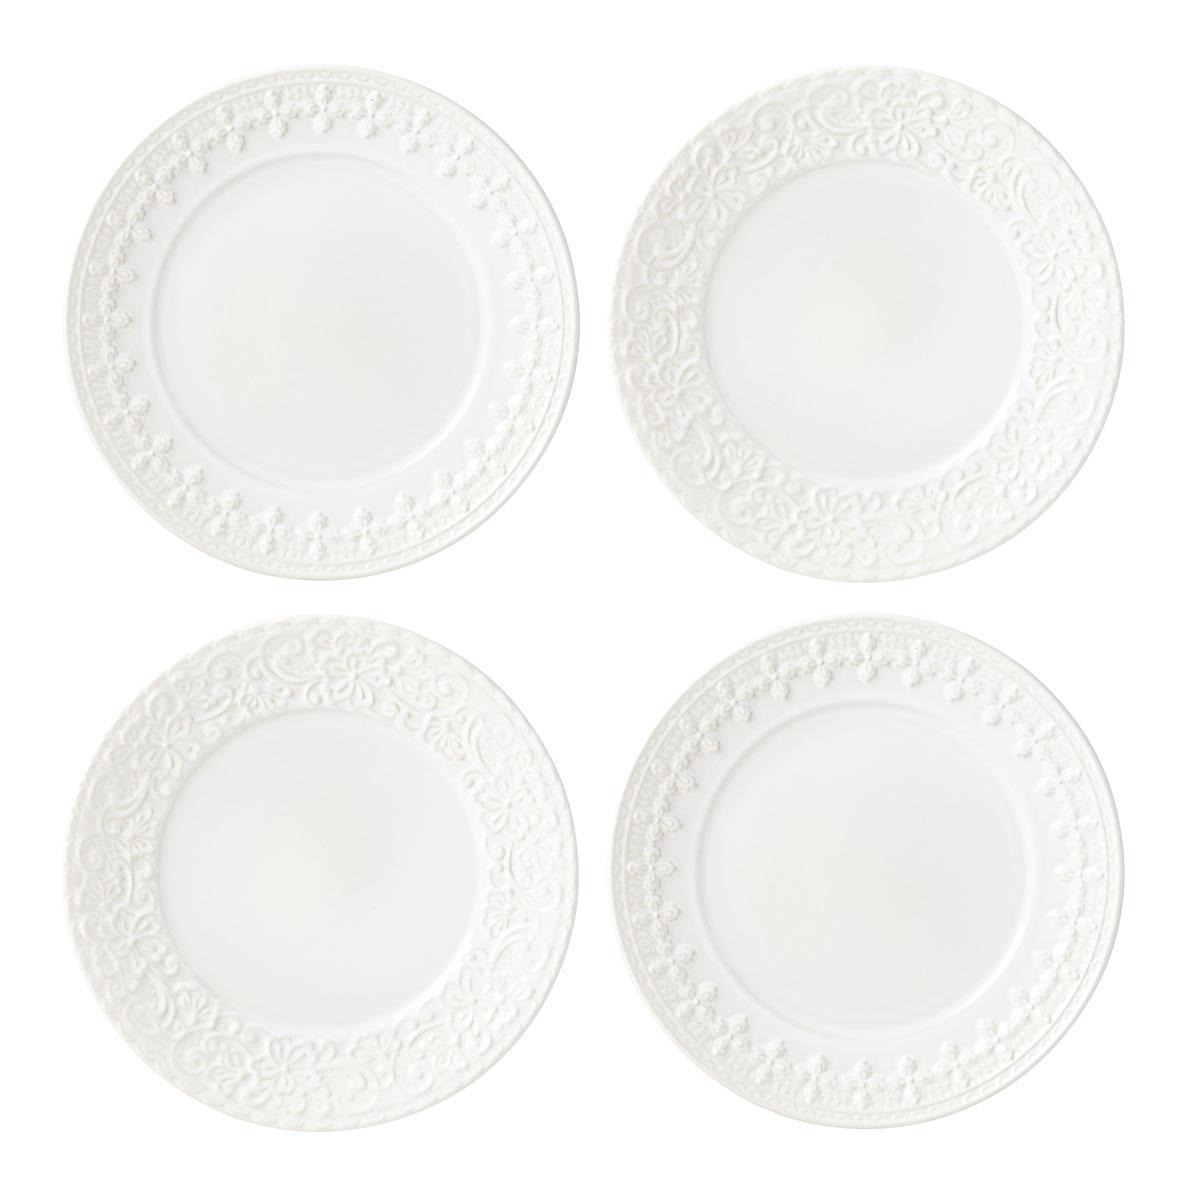 Lenox Chelse Muse Dinnerware Rct White Tidbits Set Of Four